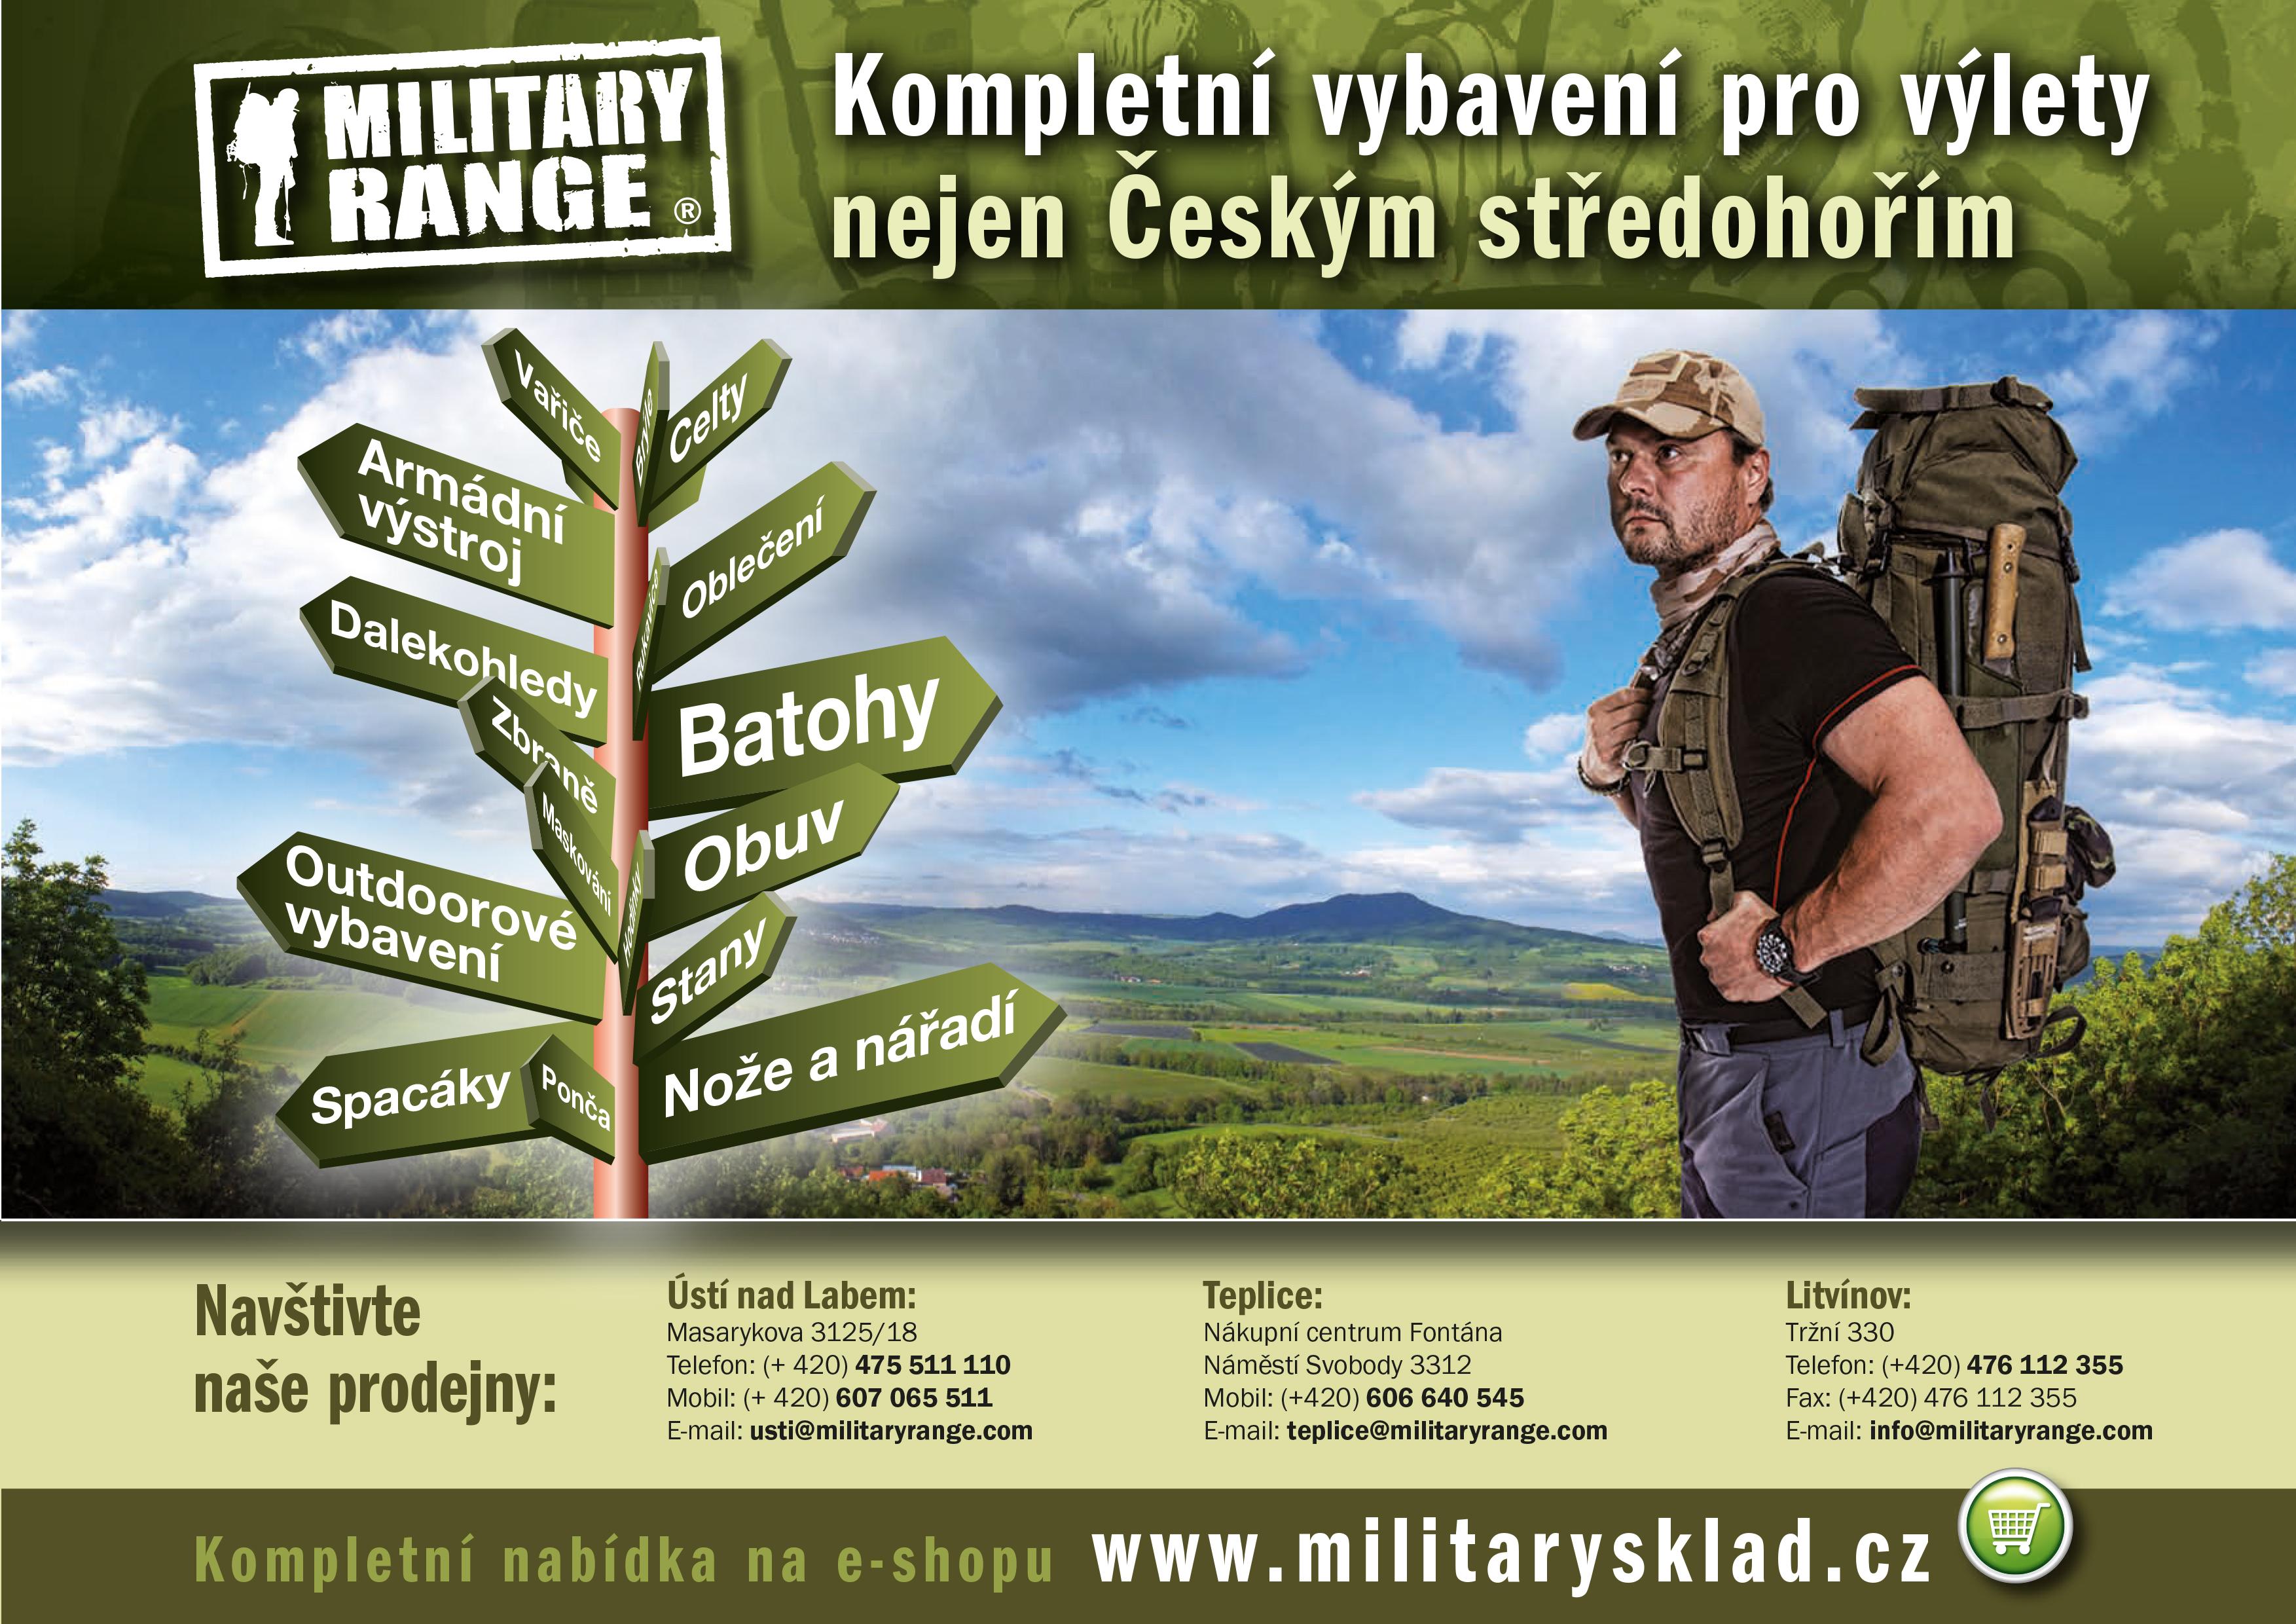 Military Range